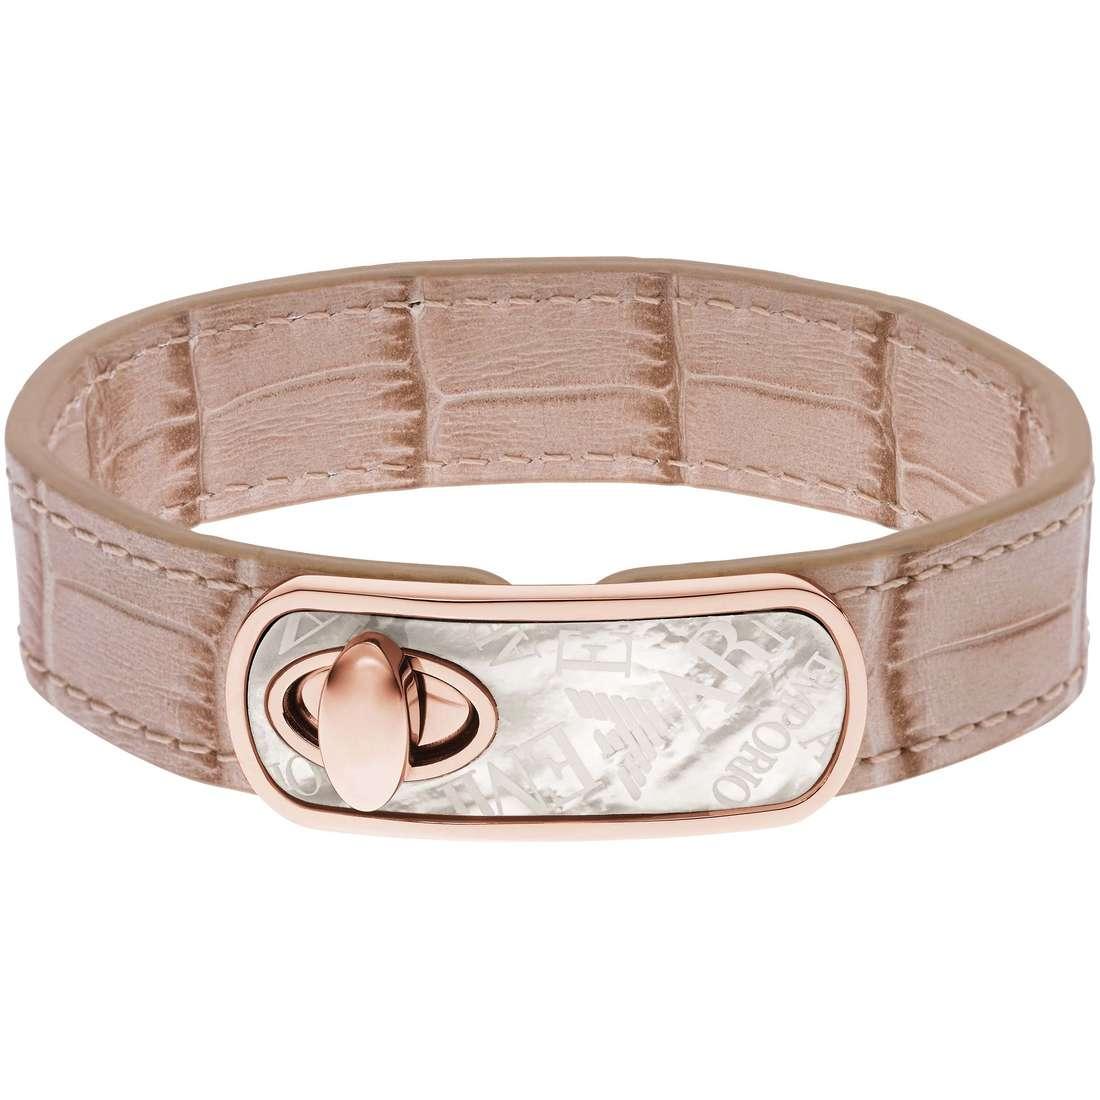 bracelet woman jewellery Emporio Armani EGS1868221